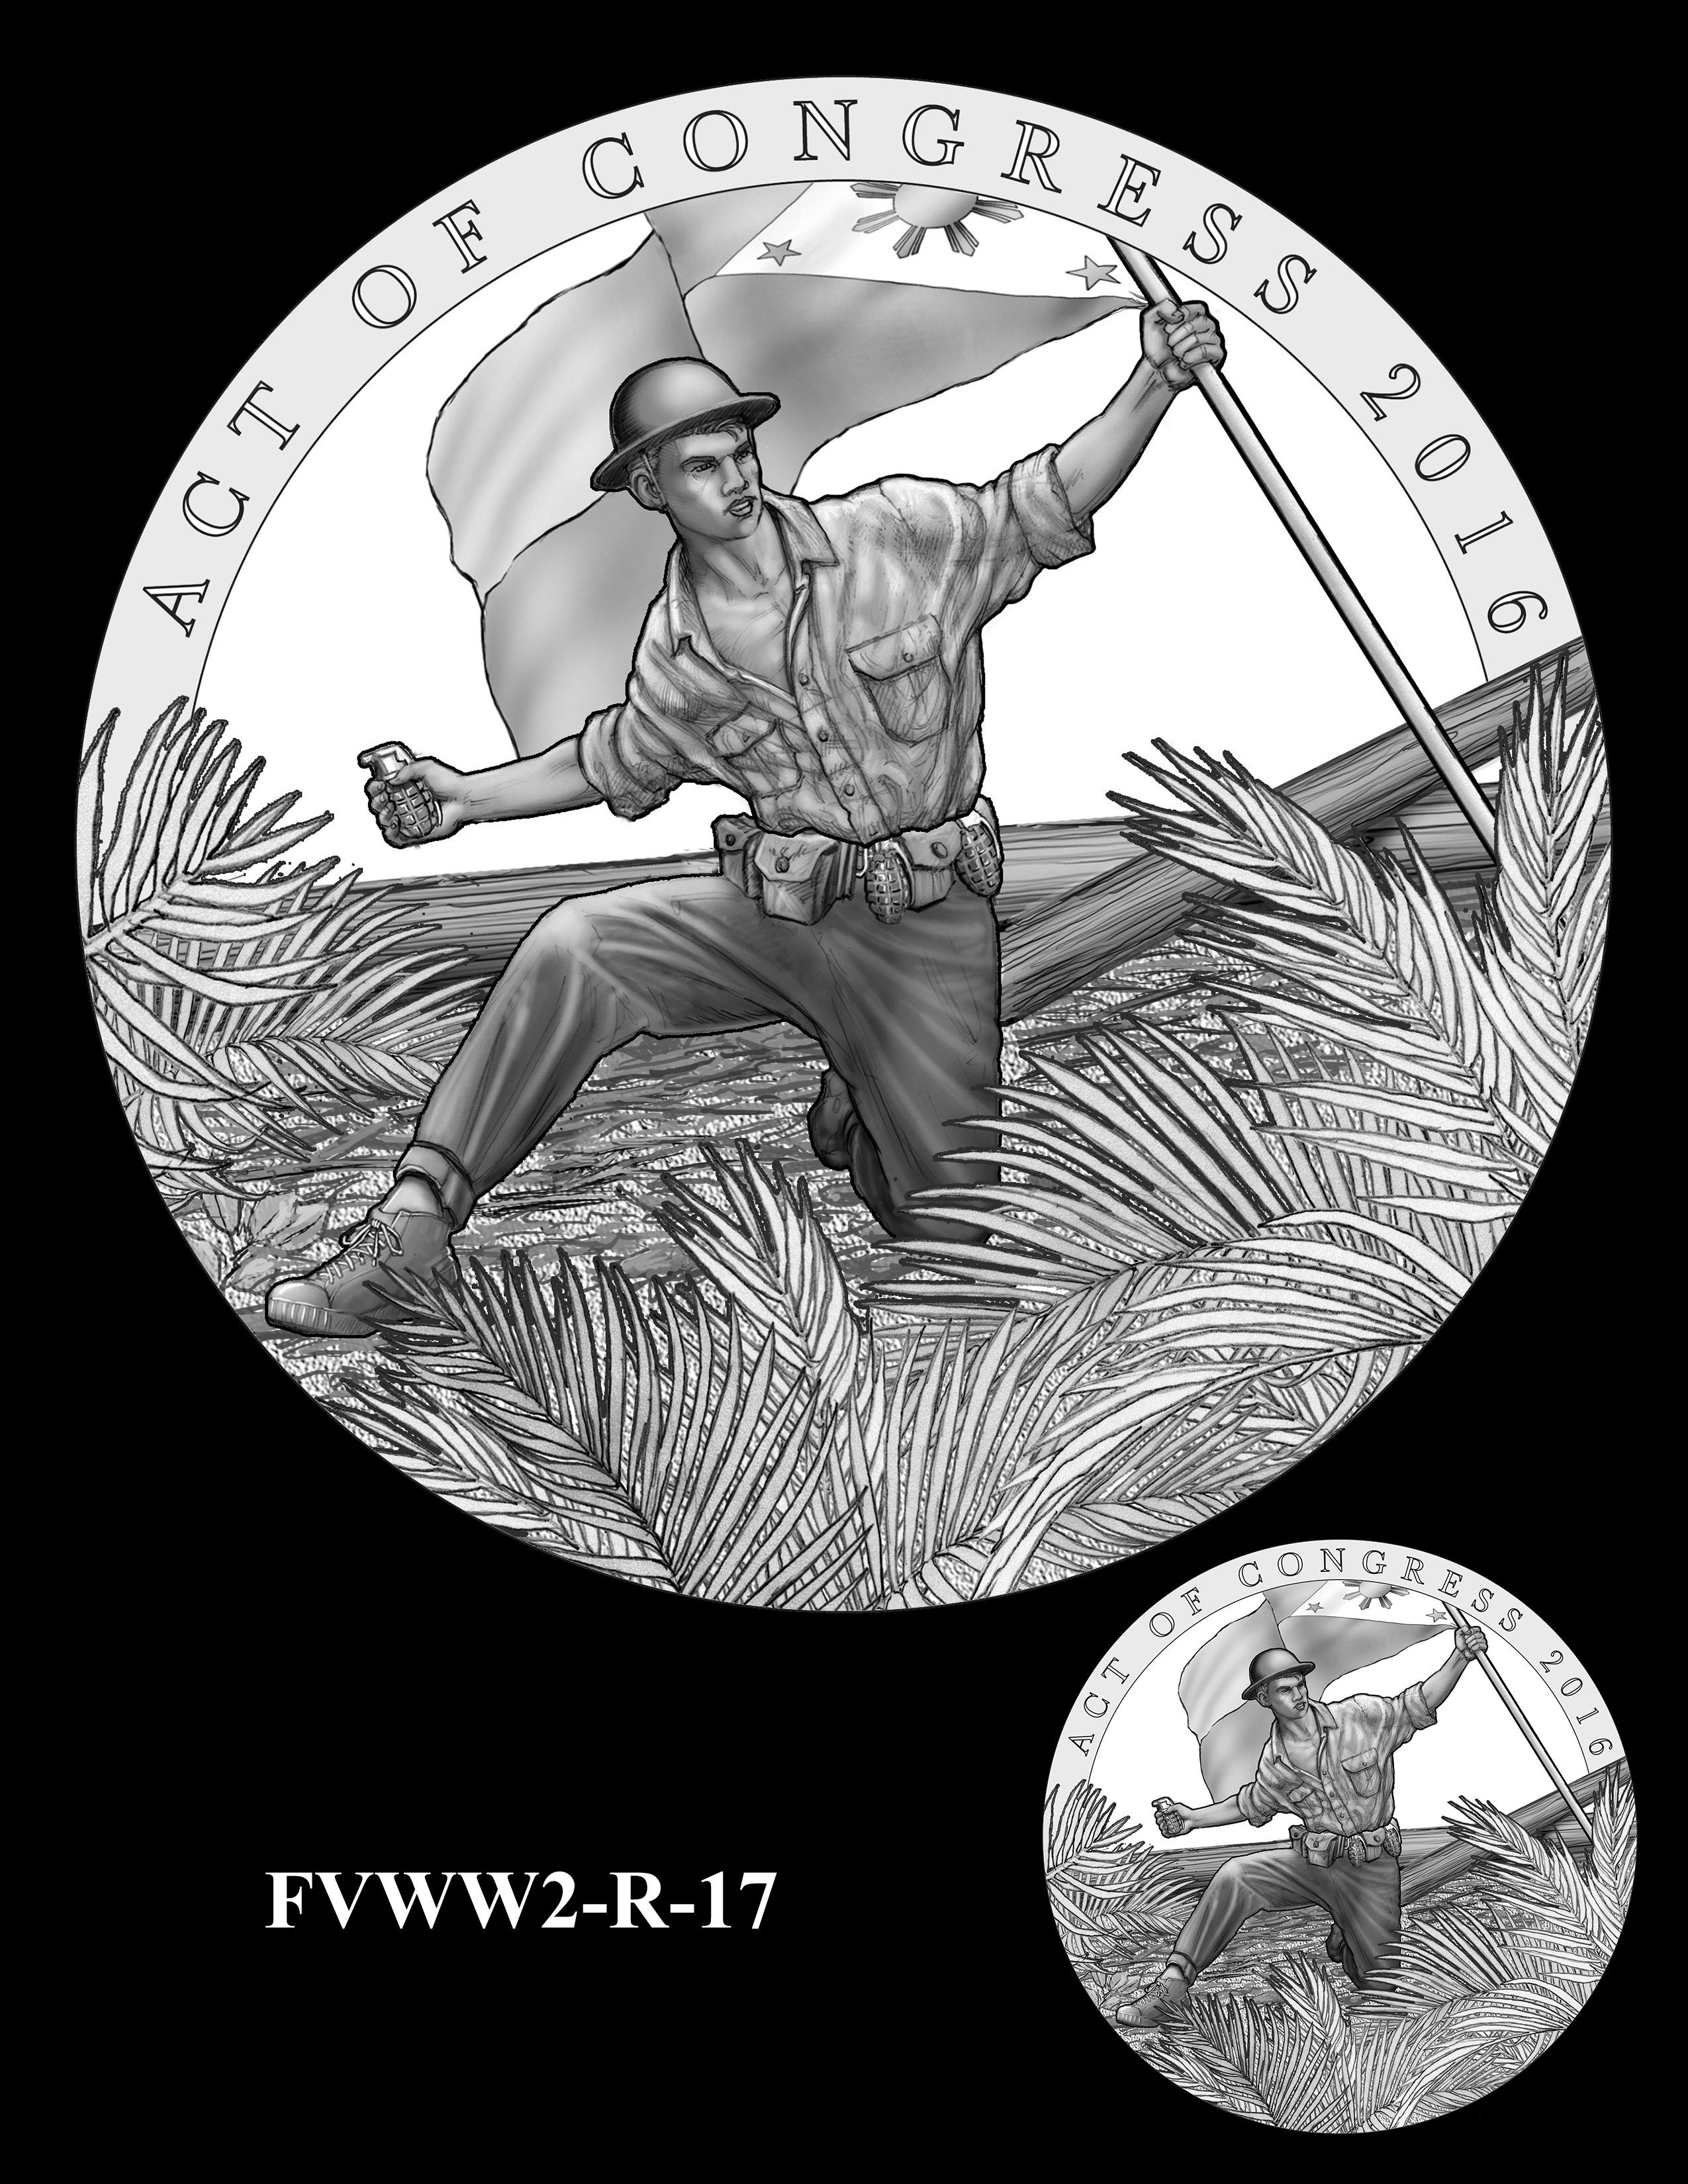 FVWW2-R-17 -- Filipino Veterans of World War II Congressional Gold Medal